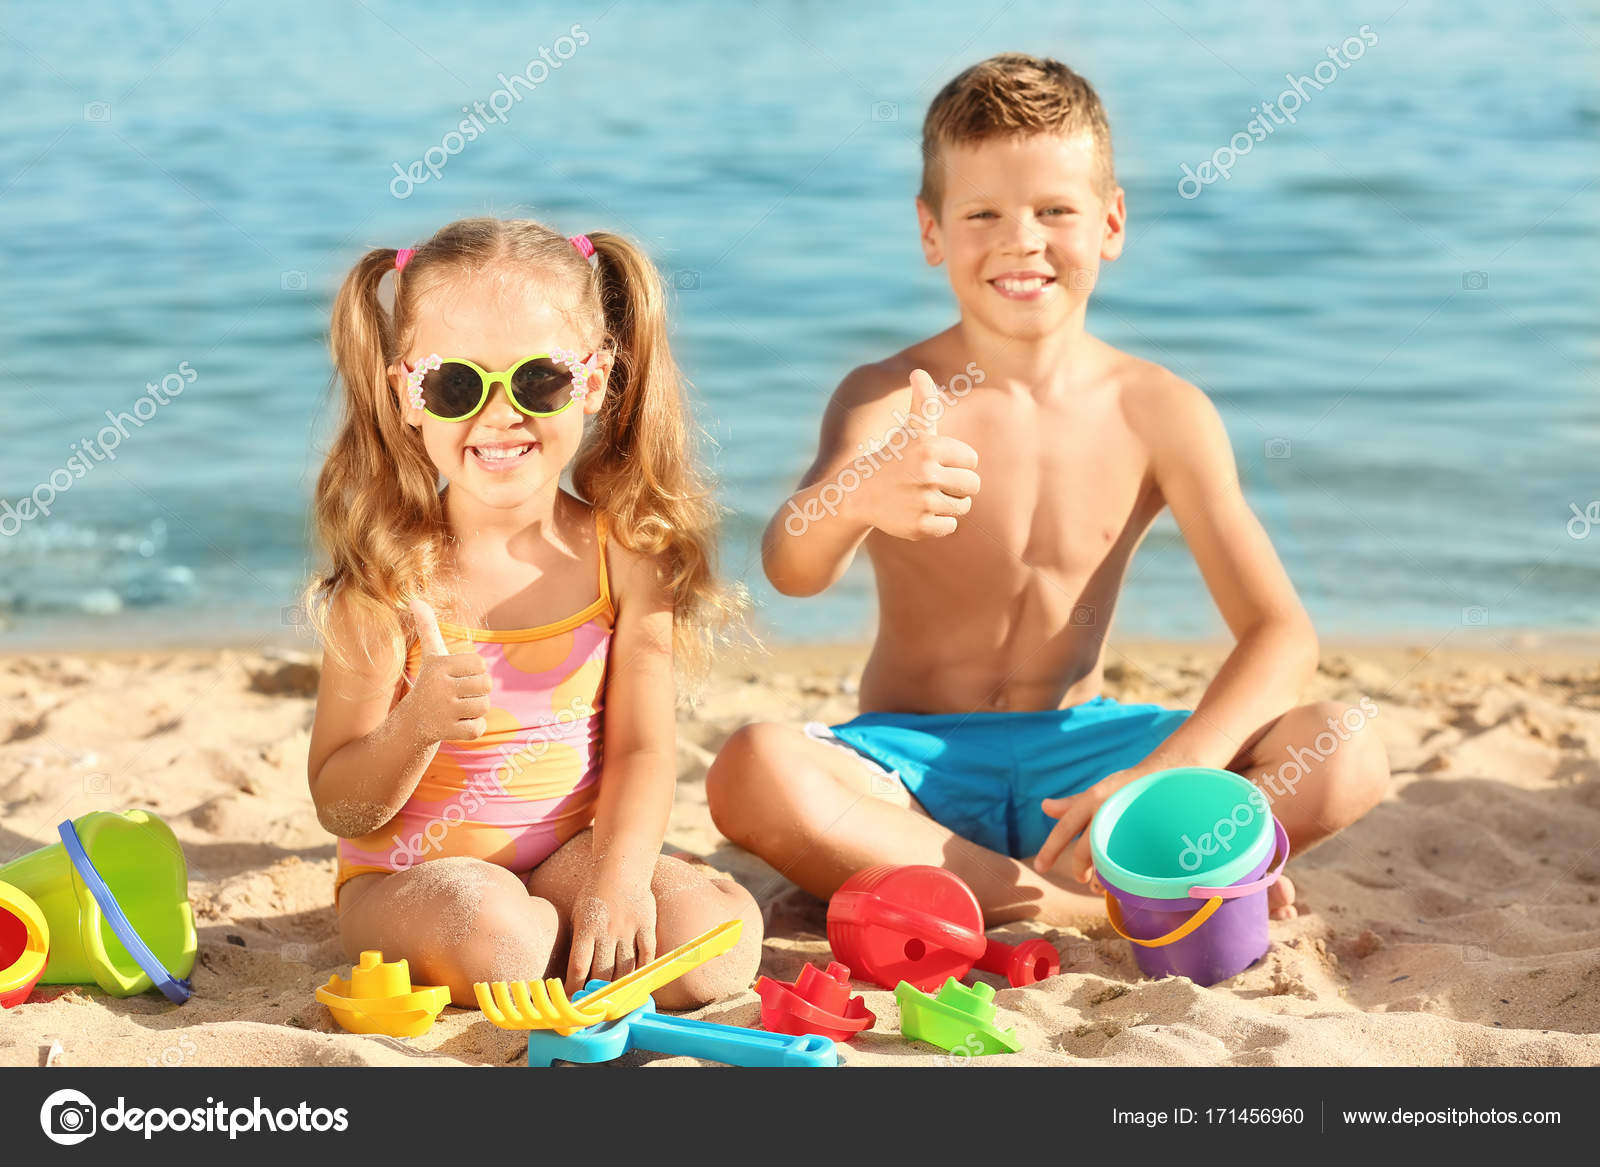 8a134348b64 Χαριτωμένο μικρό παιδιά που παίζουν στην παραλία της θάλασσας — Φωτογραφία  Αρχείου